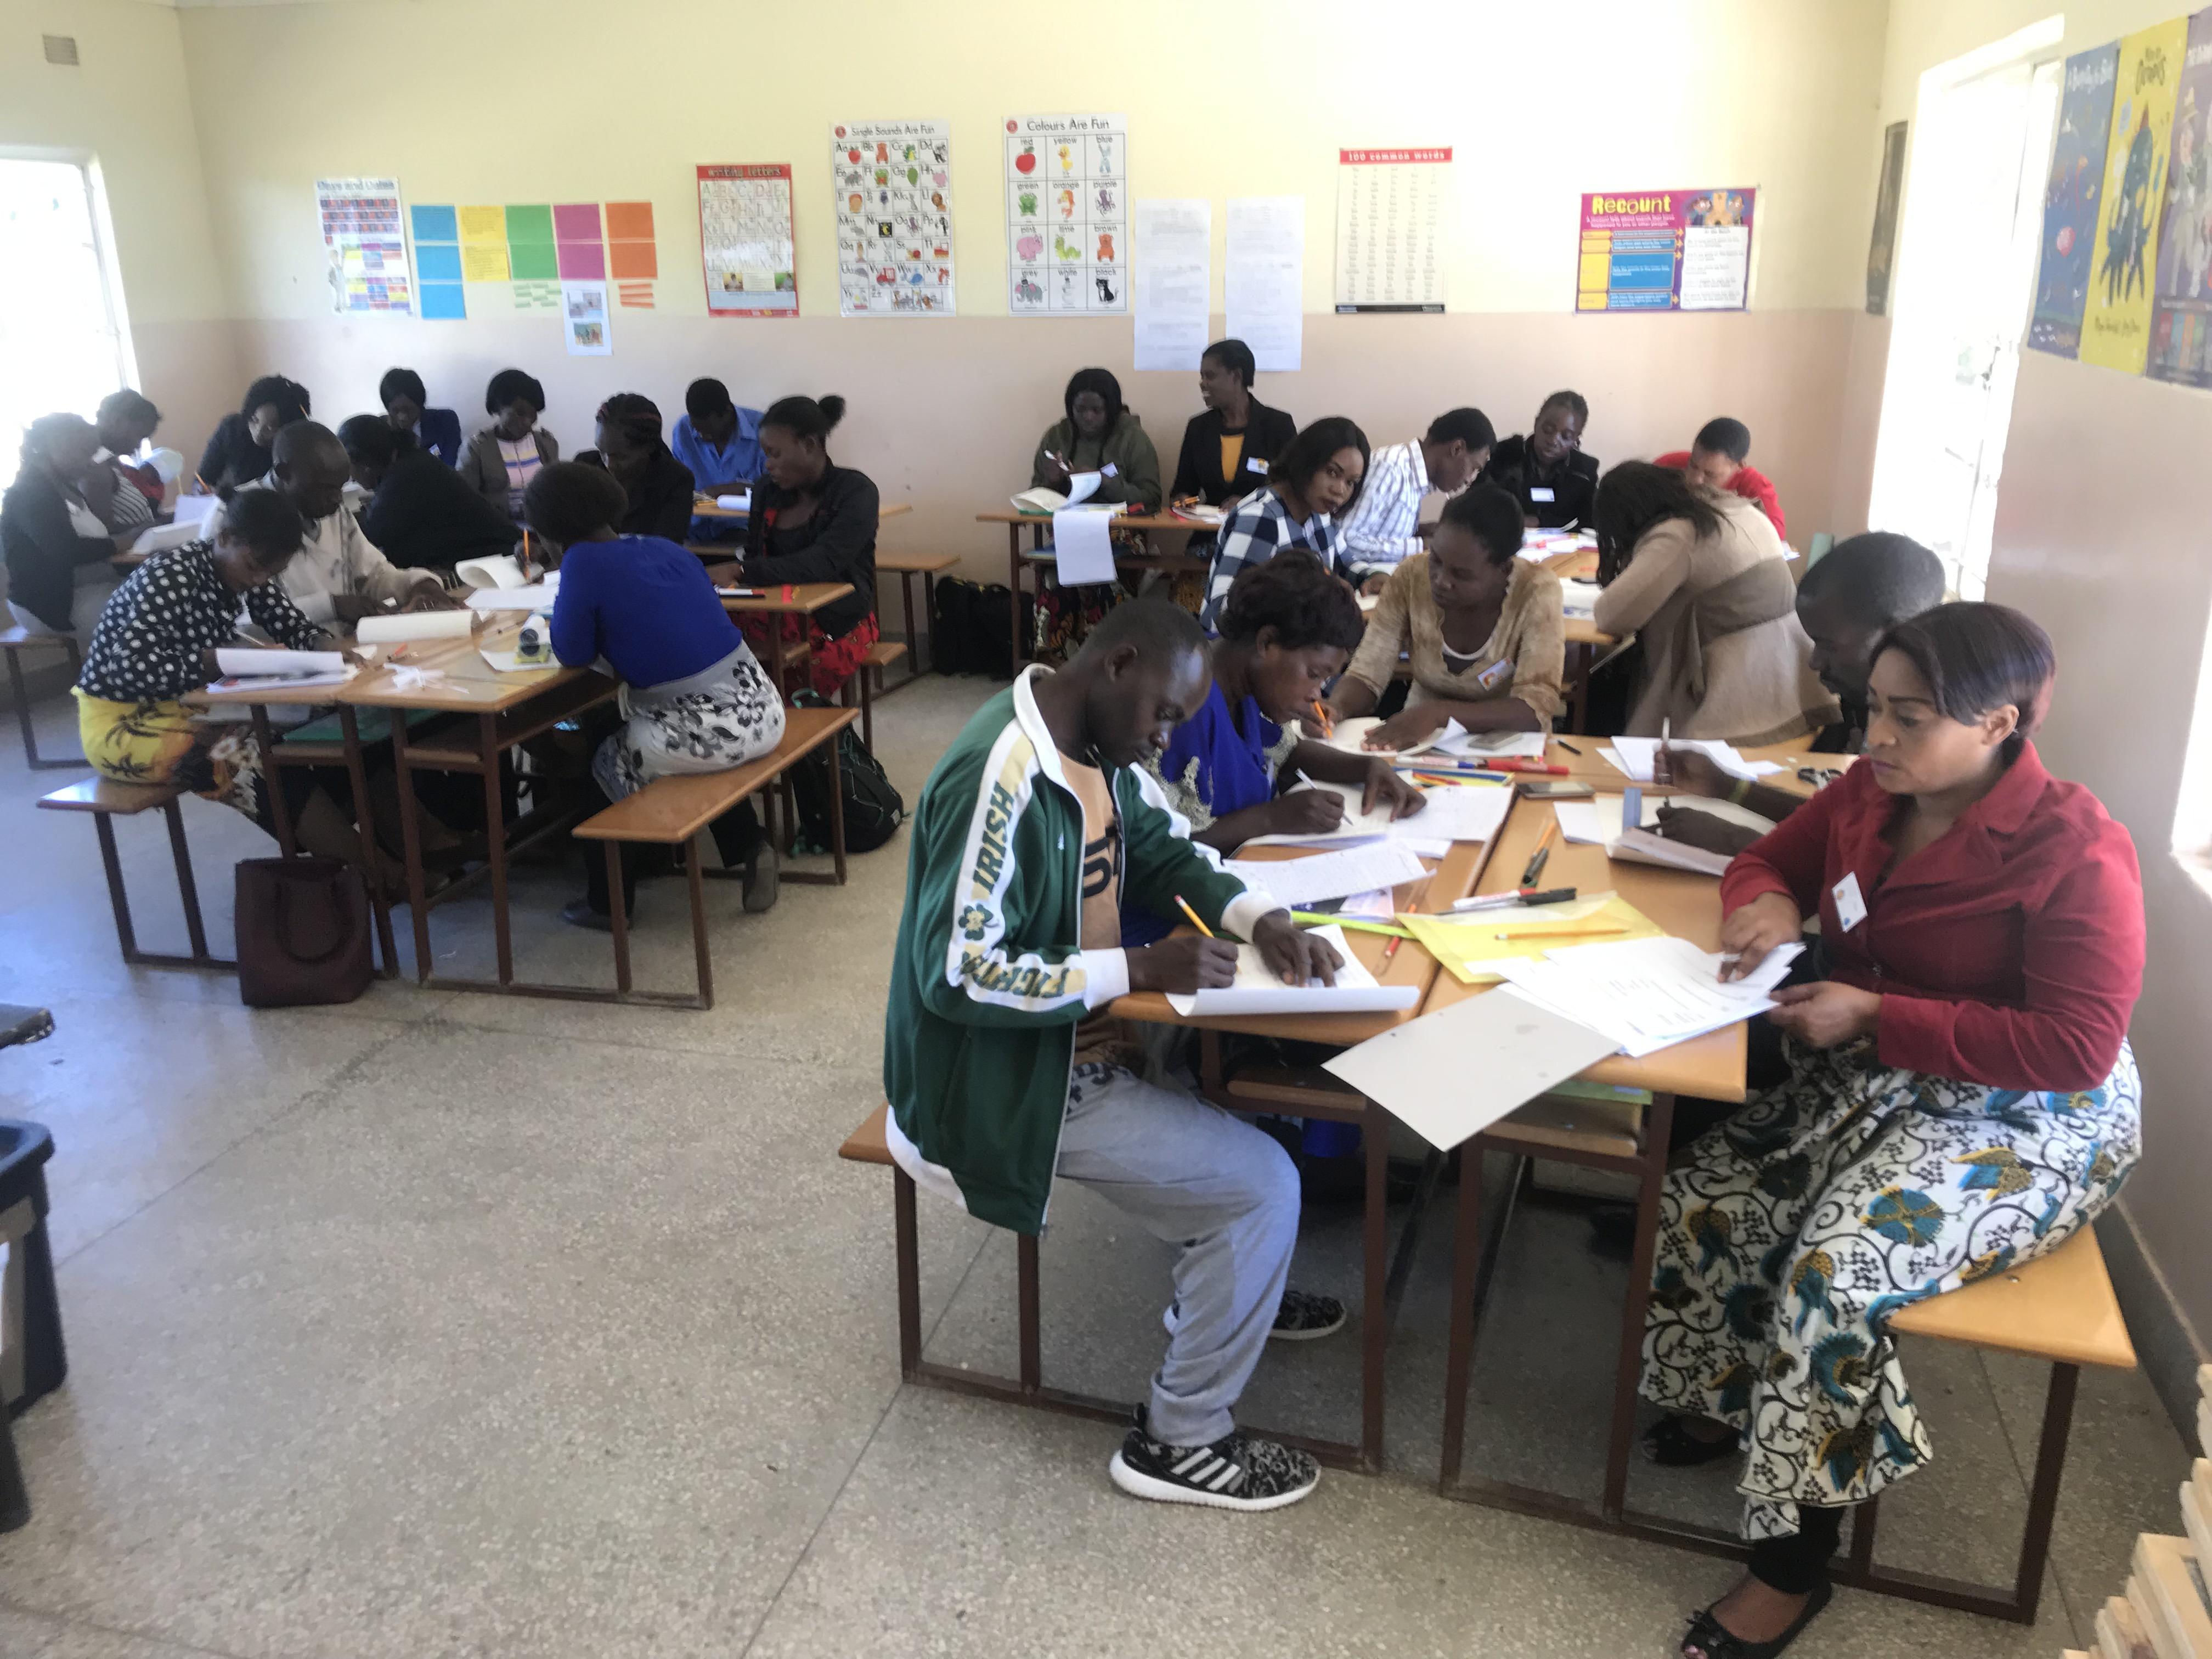 class focused on writing